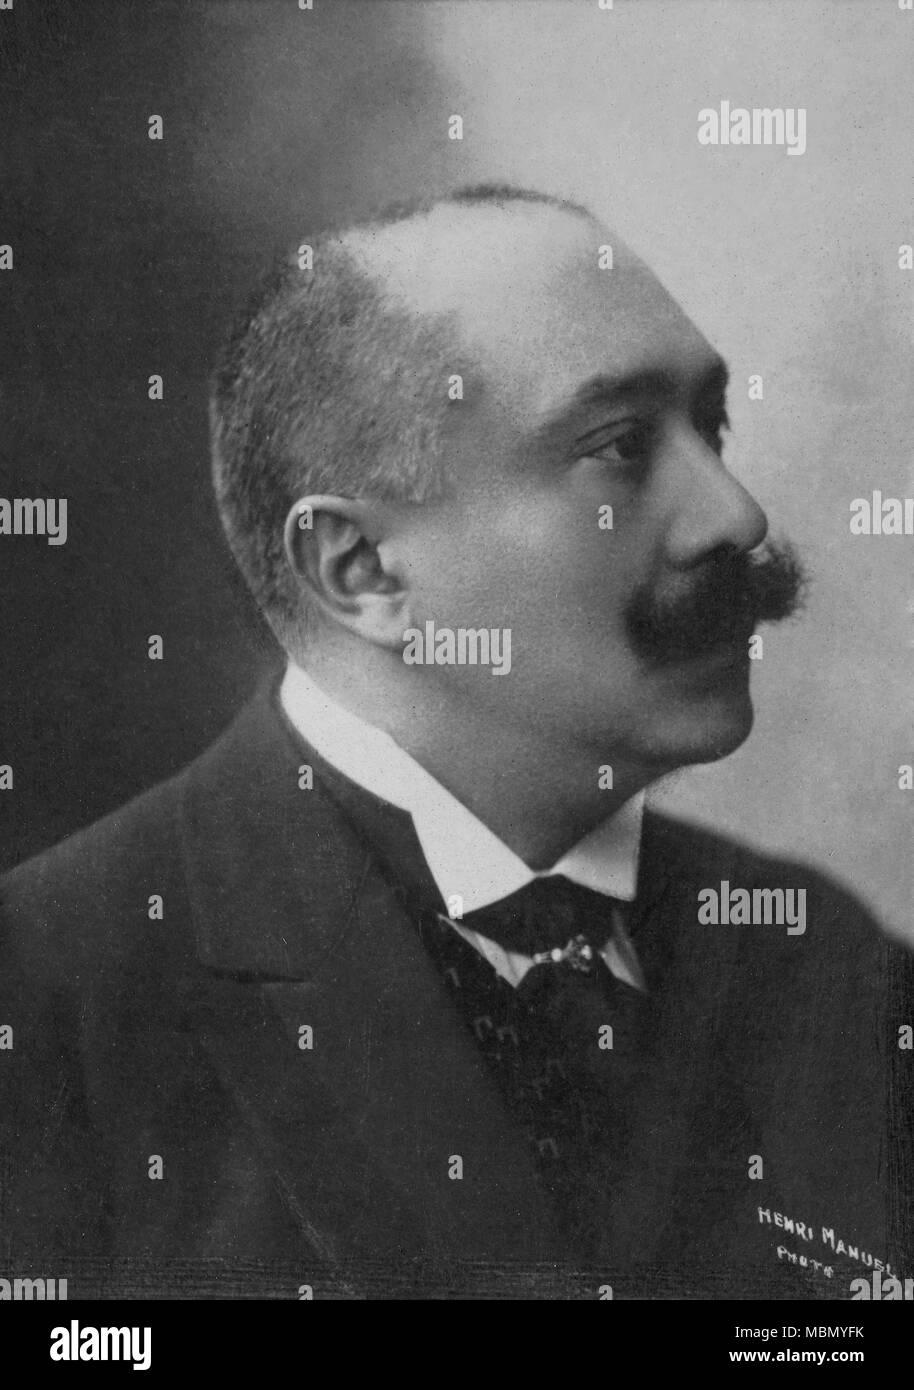 Portrait of Joseph Ruau ( 1865 - 1923 )  -  photography by    Henri Manuel ( 1874 - 1947 ) - Stock Image